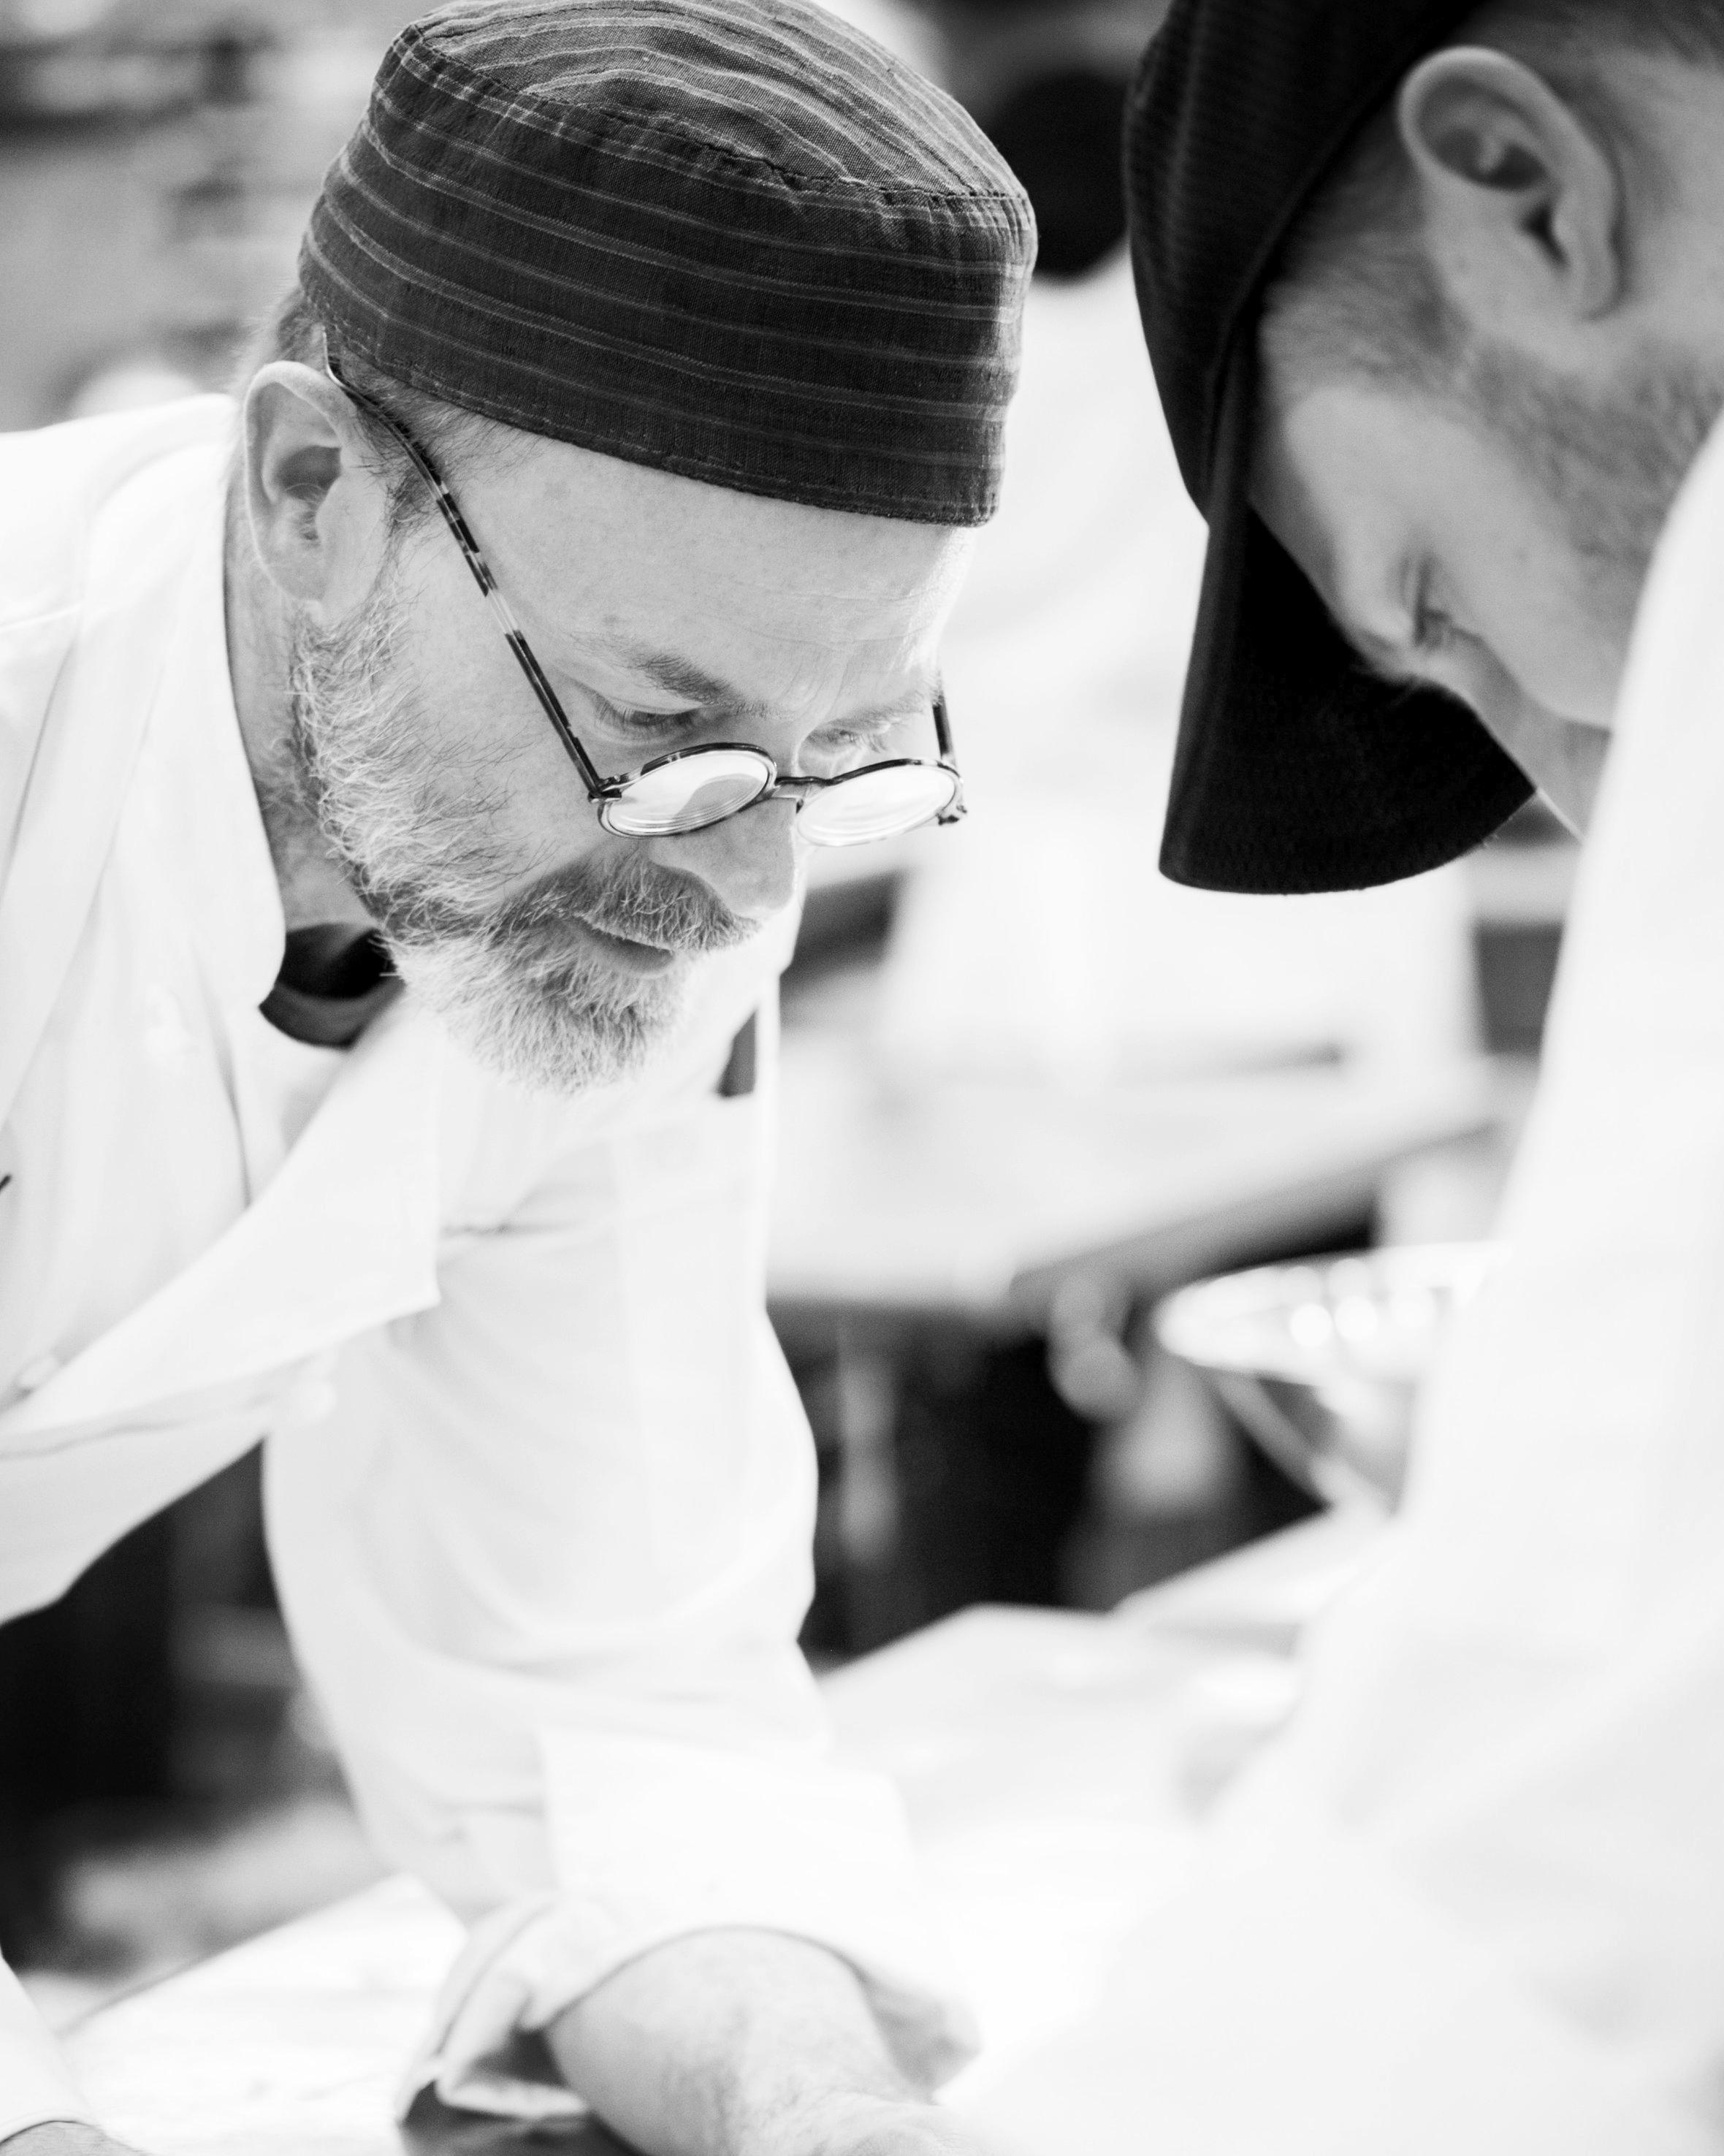 Mark Russell - Chef de Cuisine